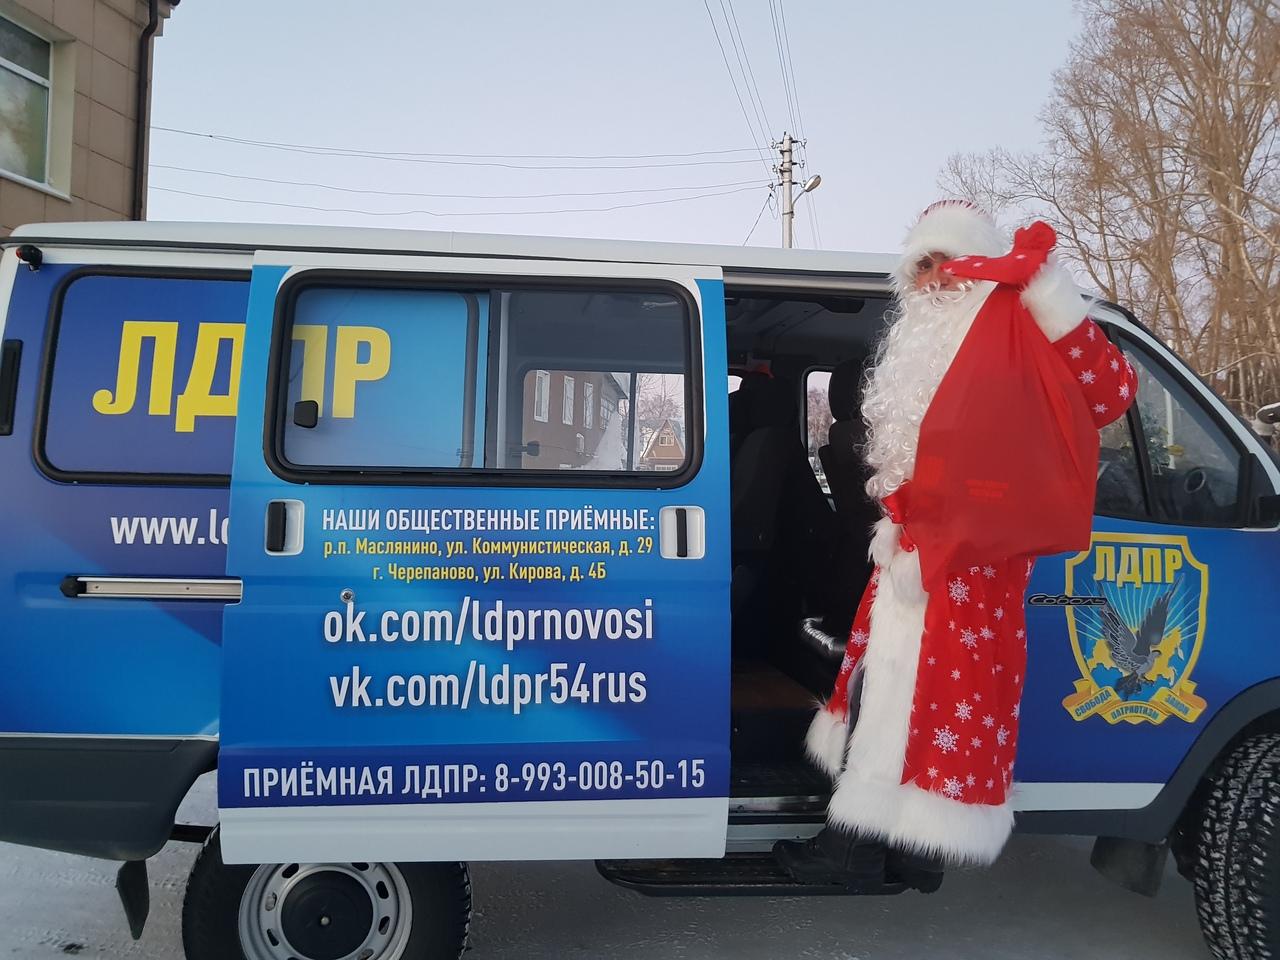 Дед Мороз ЛДПР с подарками едет по области!